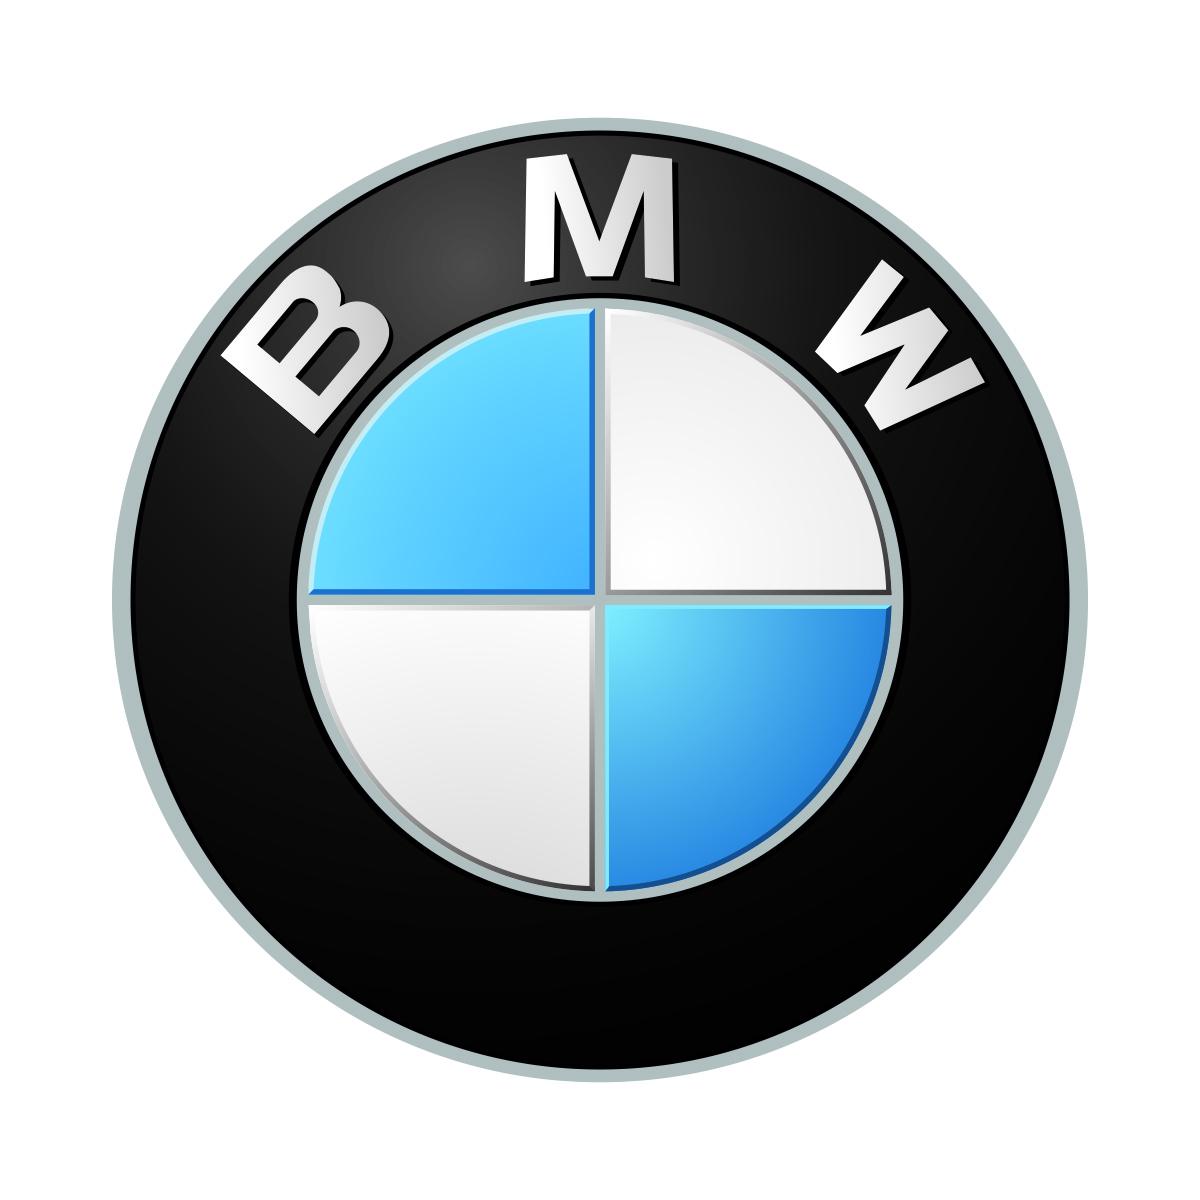 https://promotionplusinc.com/wp-content/uploads/2019/04/BMW.jpg